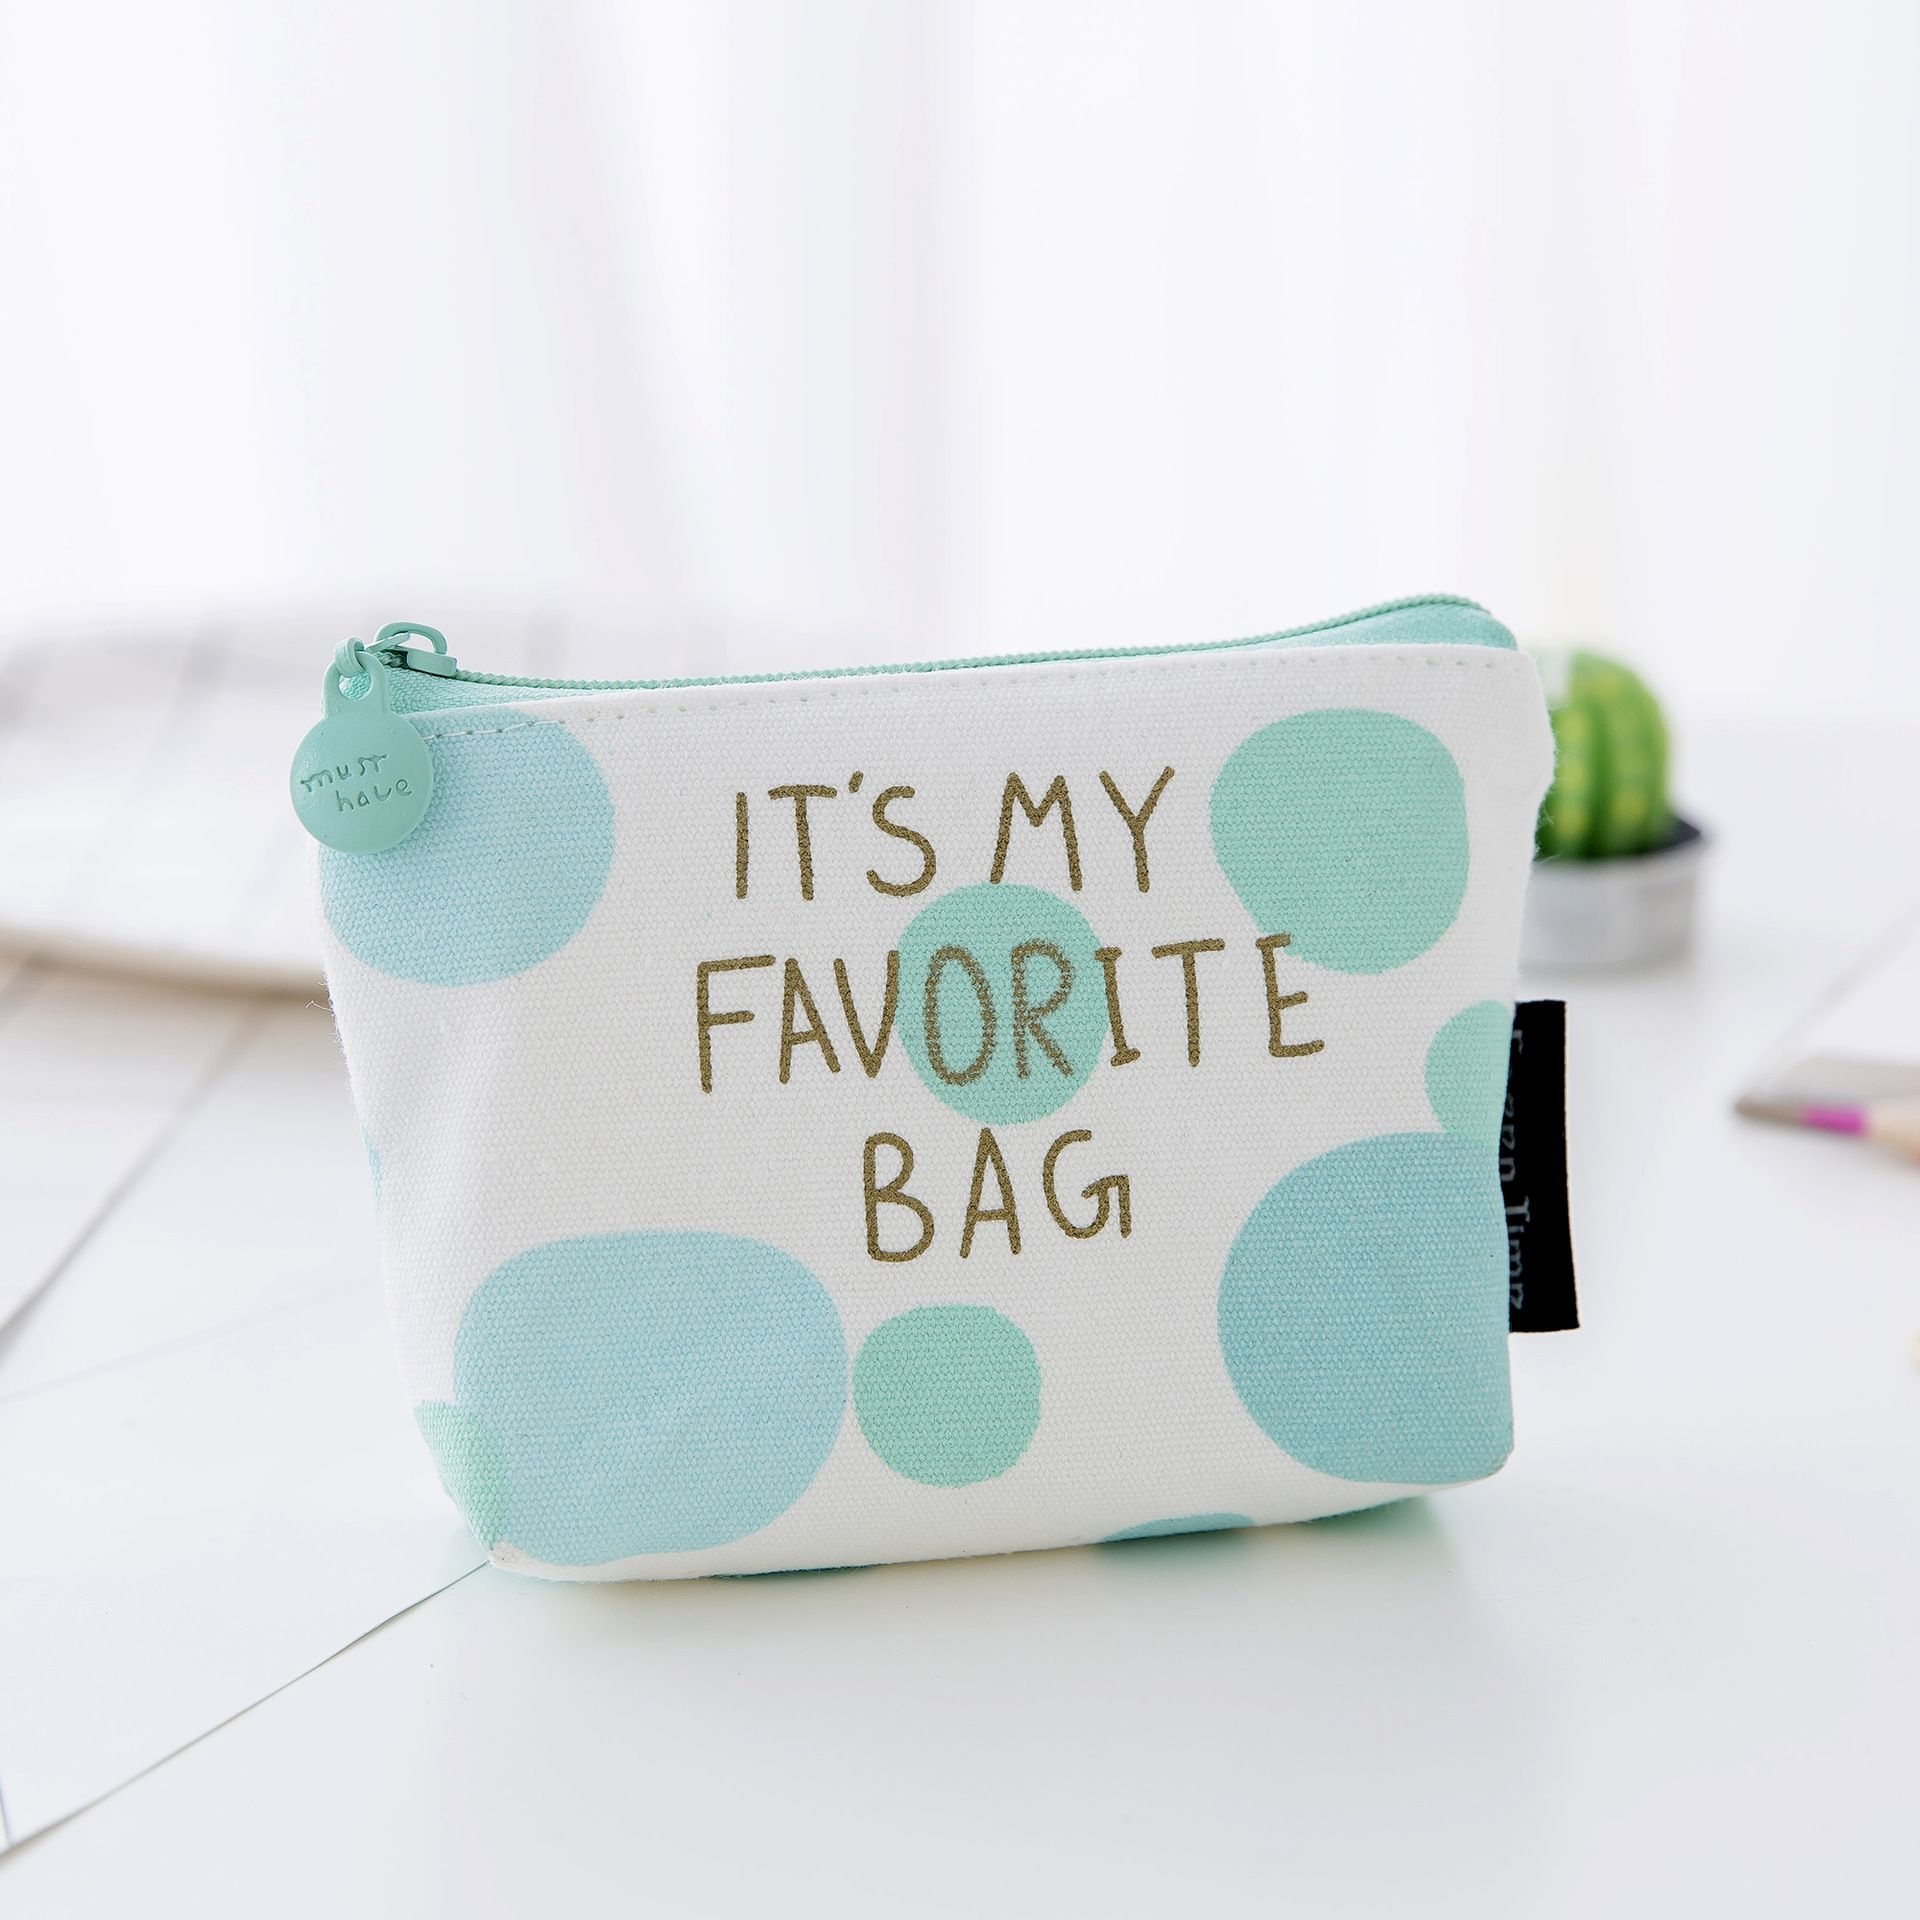 Pouch Little Money Bag Girl's Mini Coin Wallet Unisex Ladies Cheapest Canvas Small Zip Change Coin Purse Key Car B